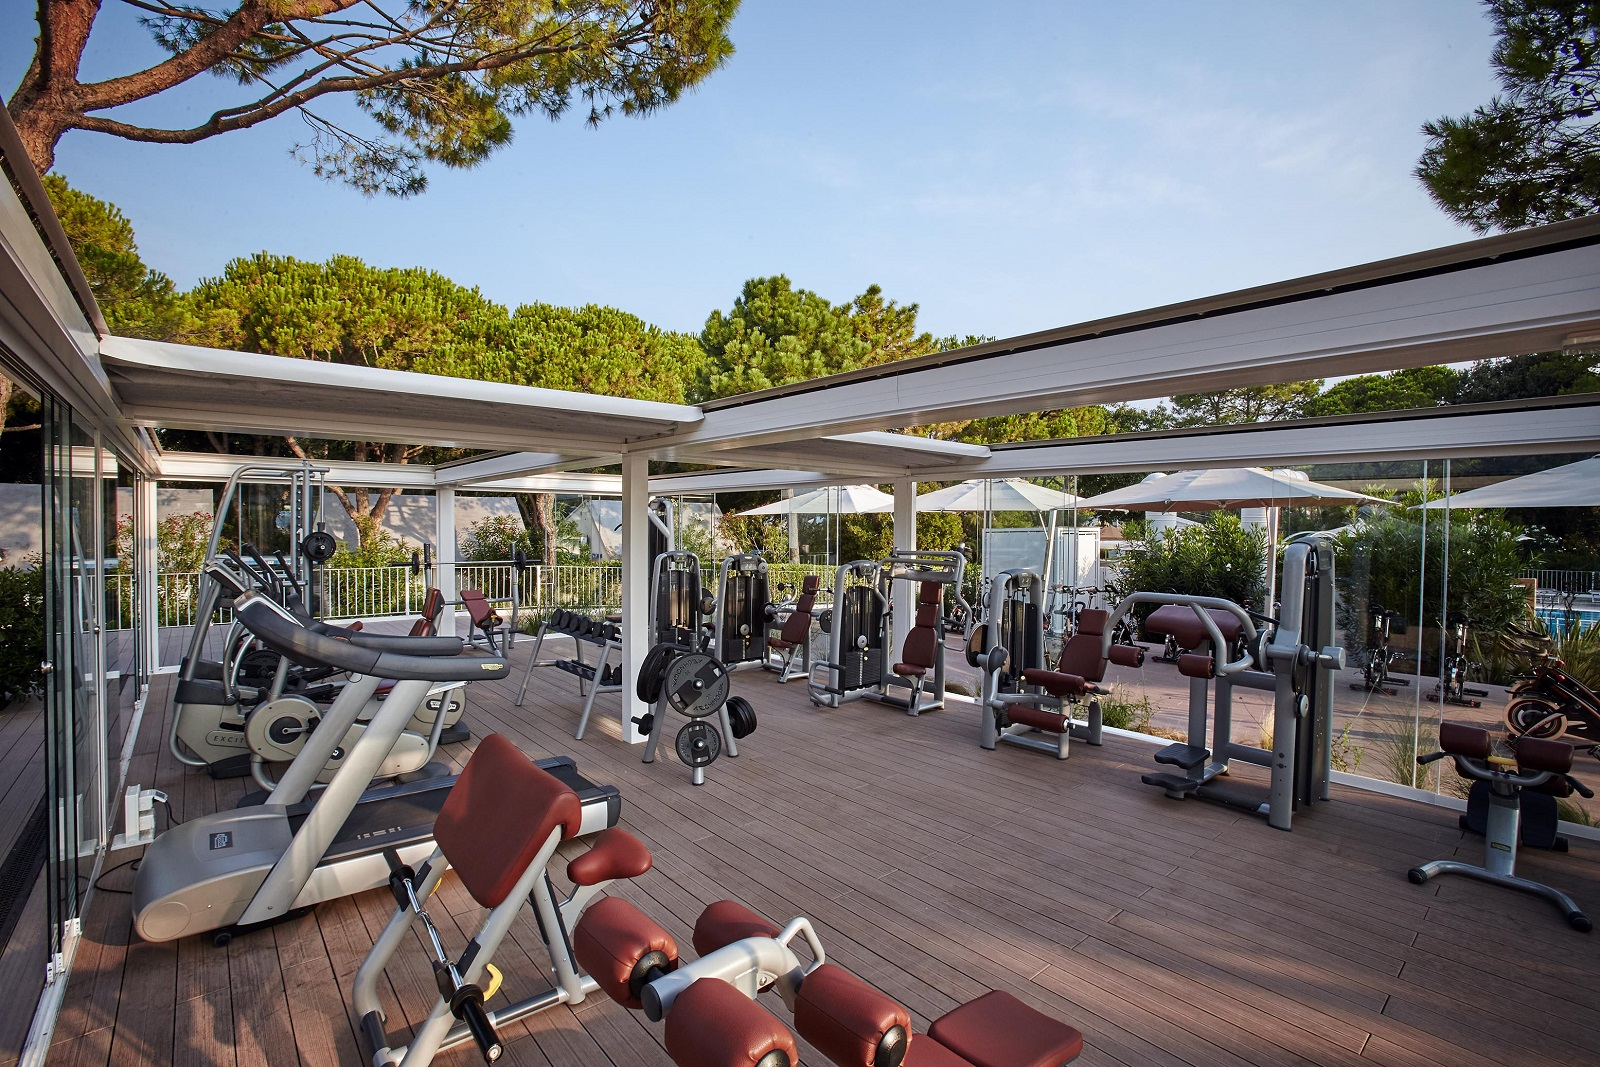 Gym-Cavallino-Treporti